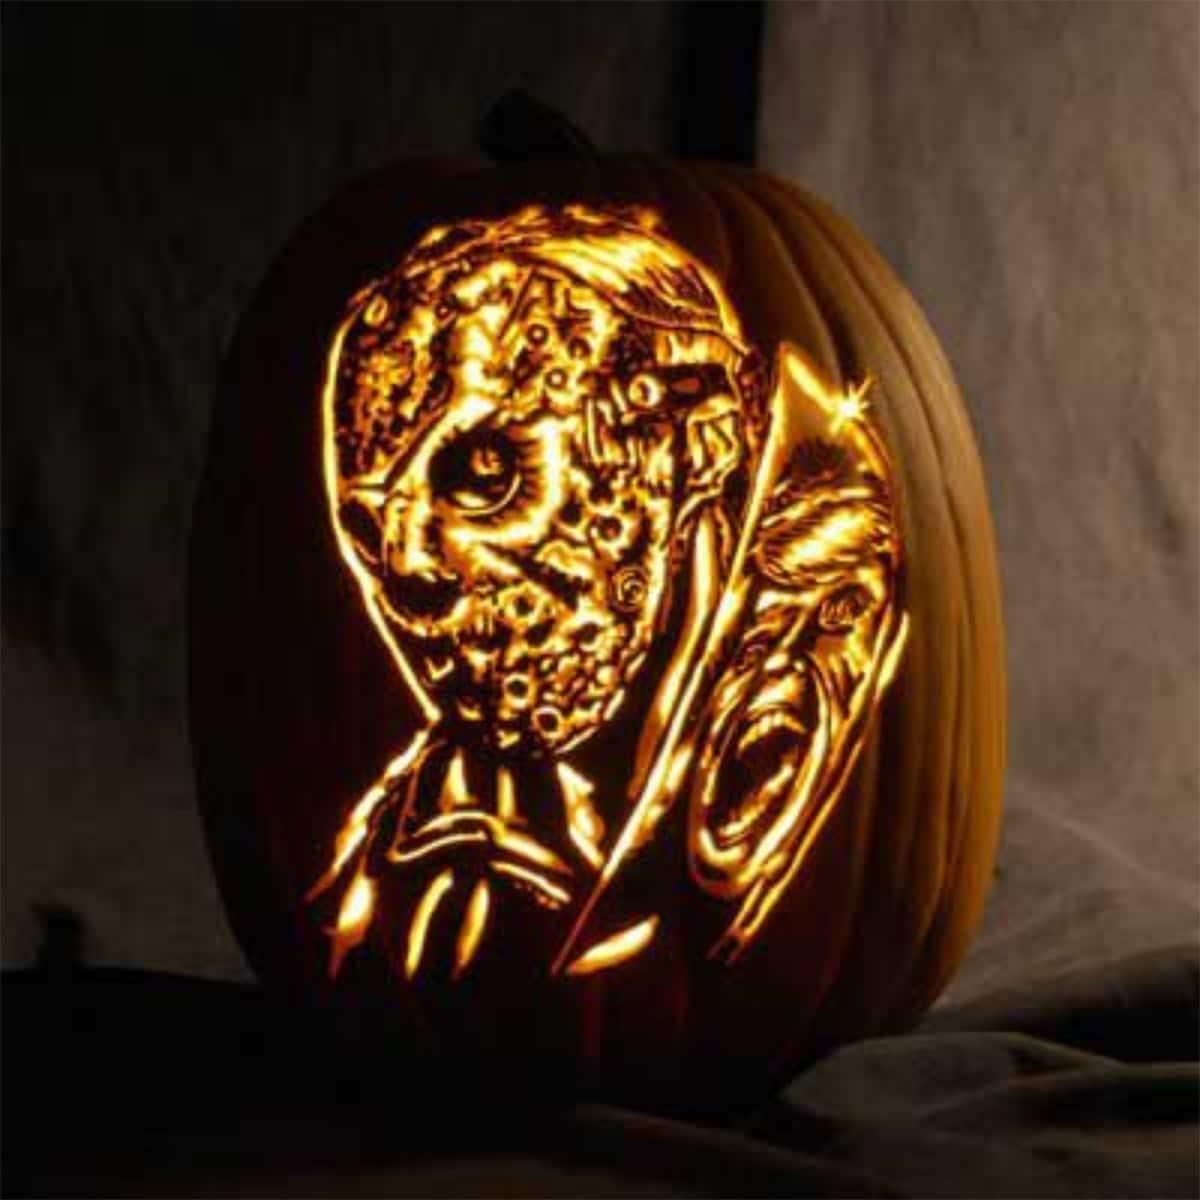 Freddy Krueger Pumpkin